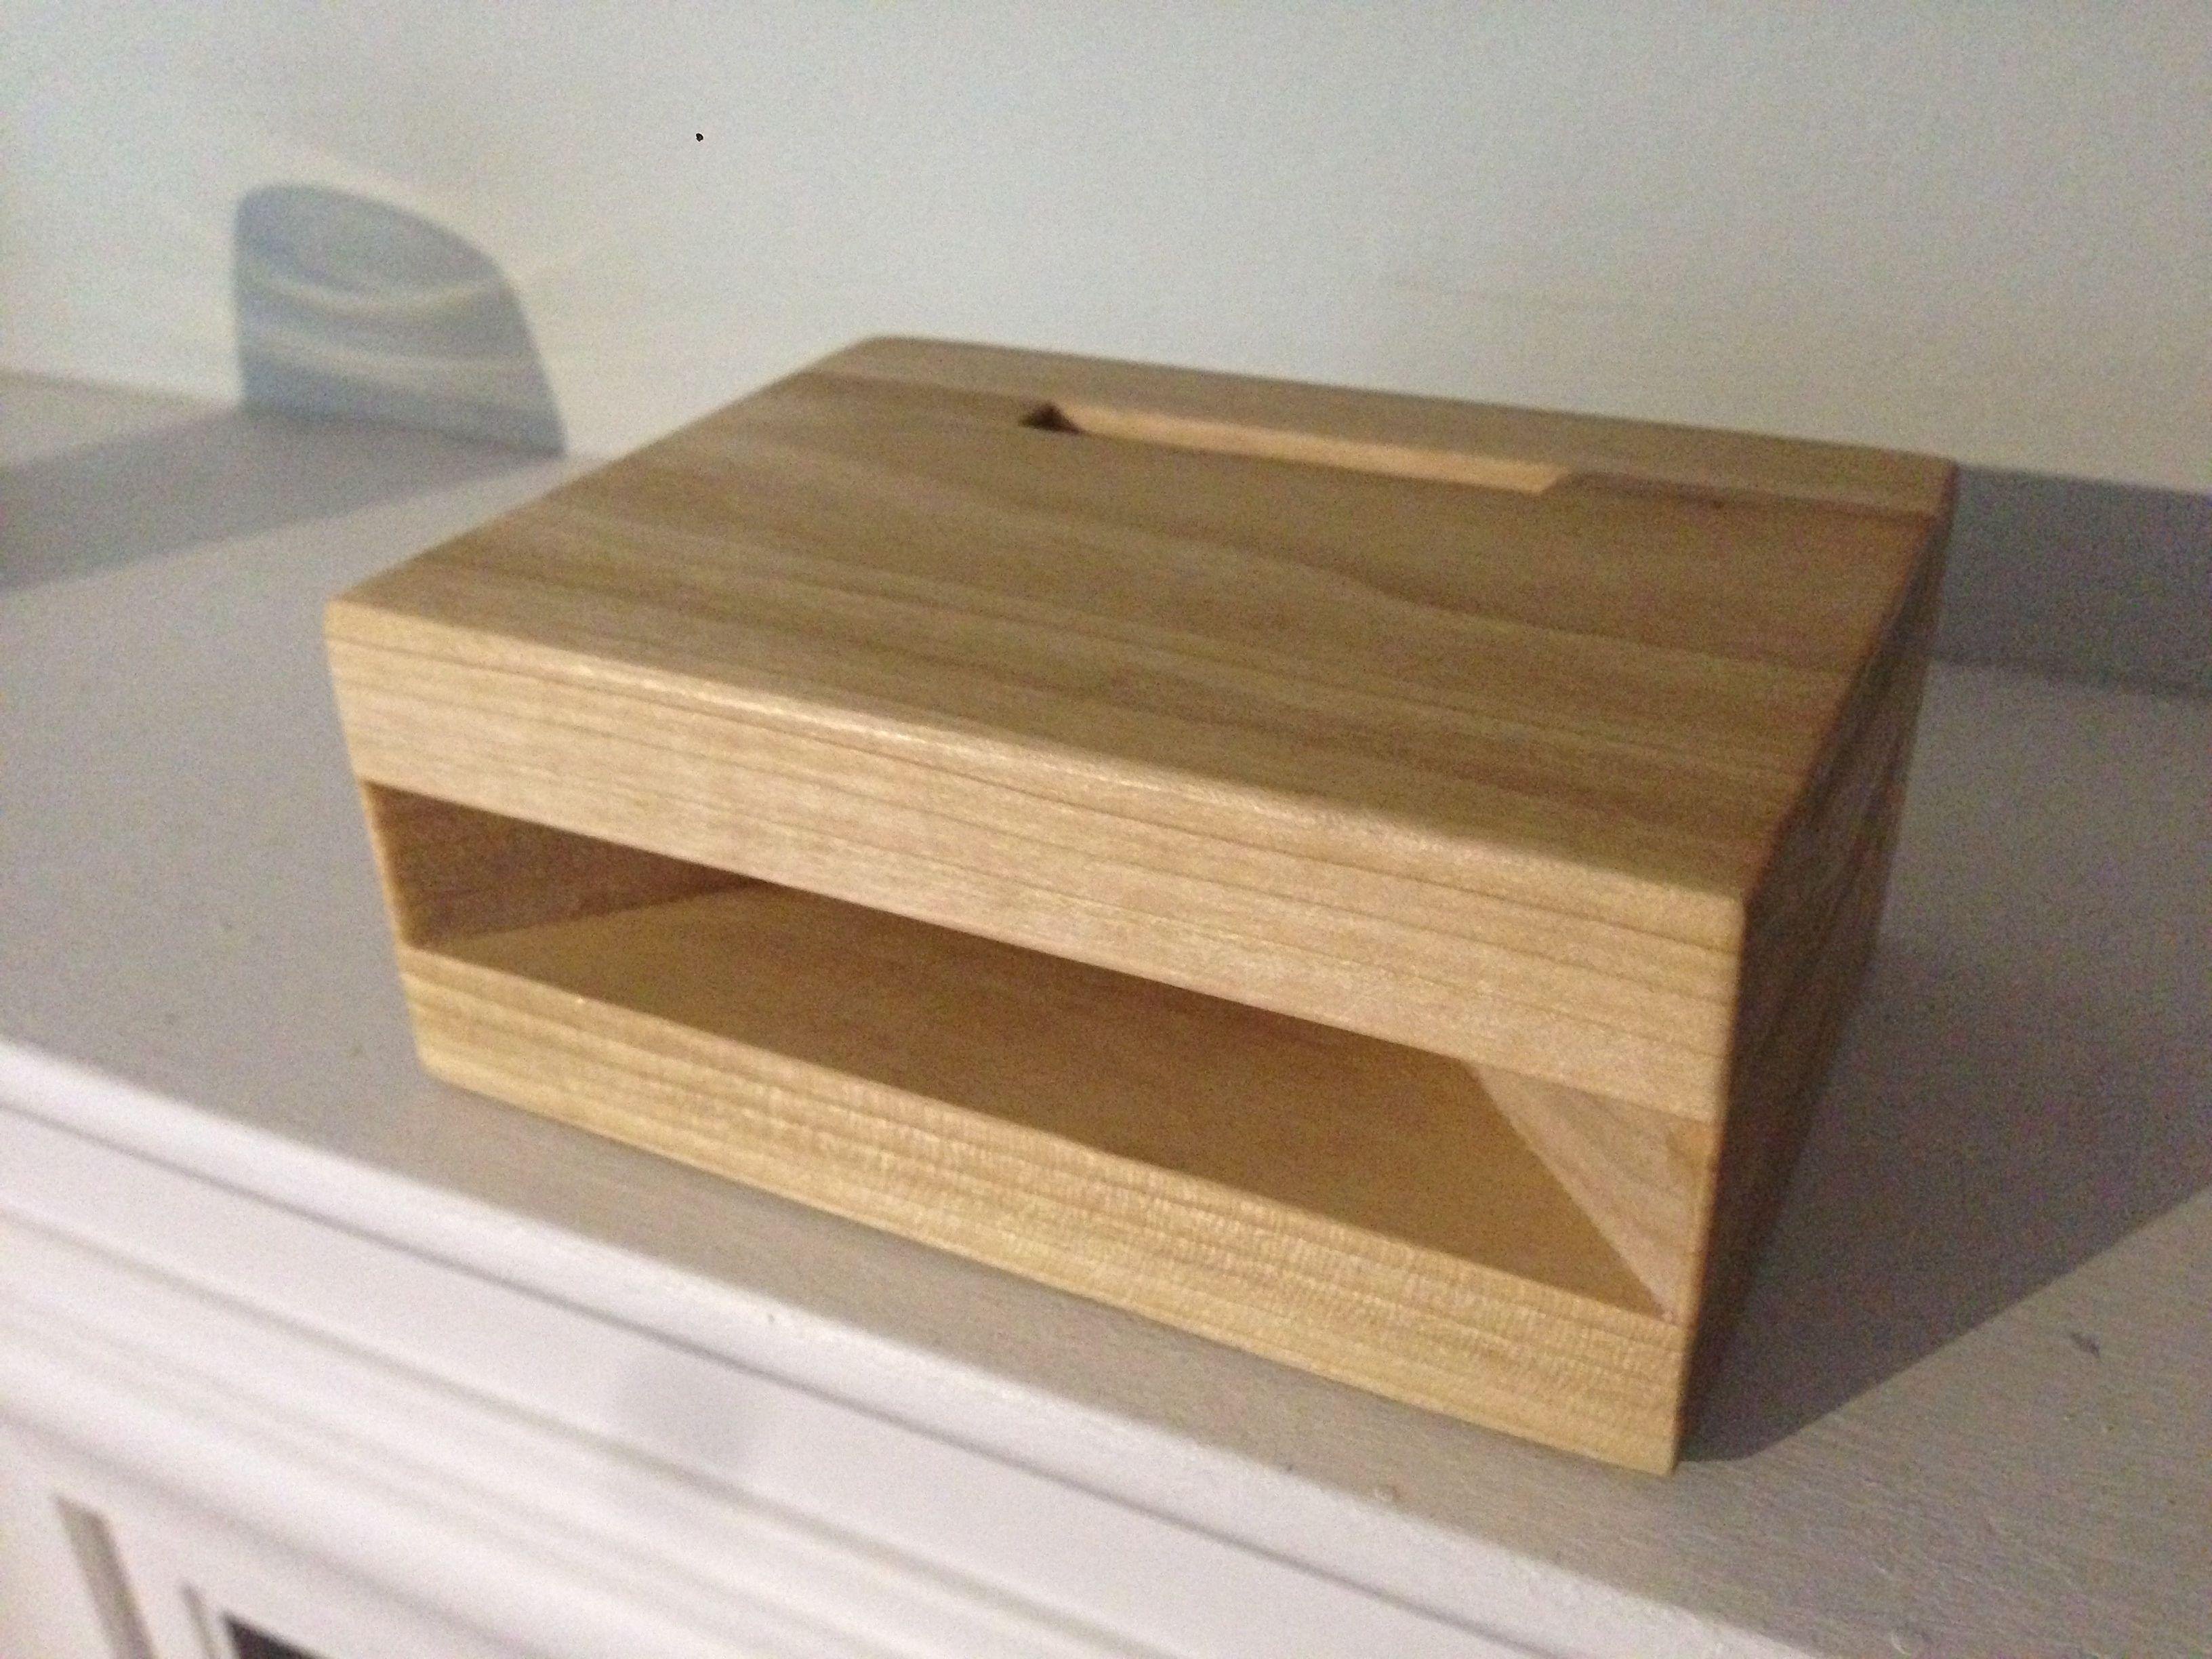 25 Diy Bunk Beds With Plans: Wooden Smartphone Amplifier